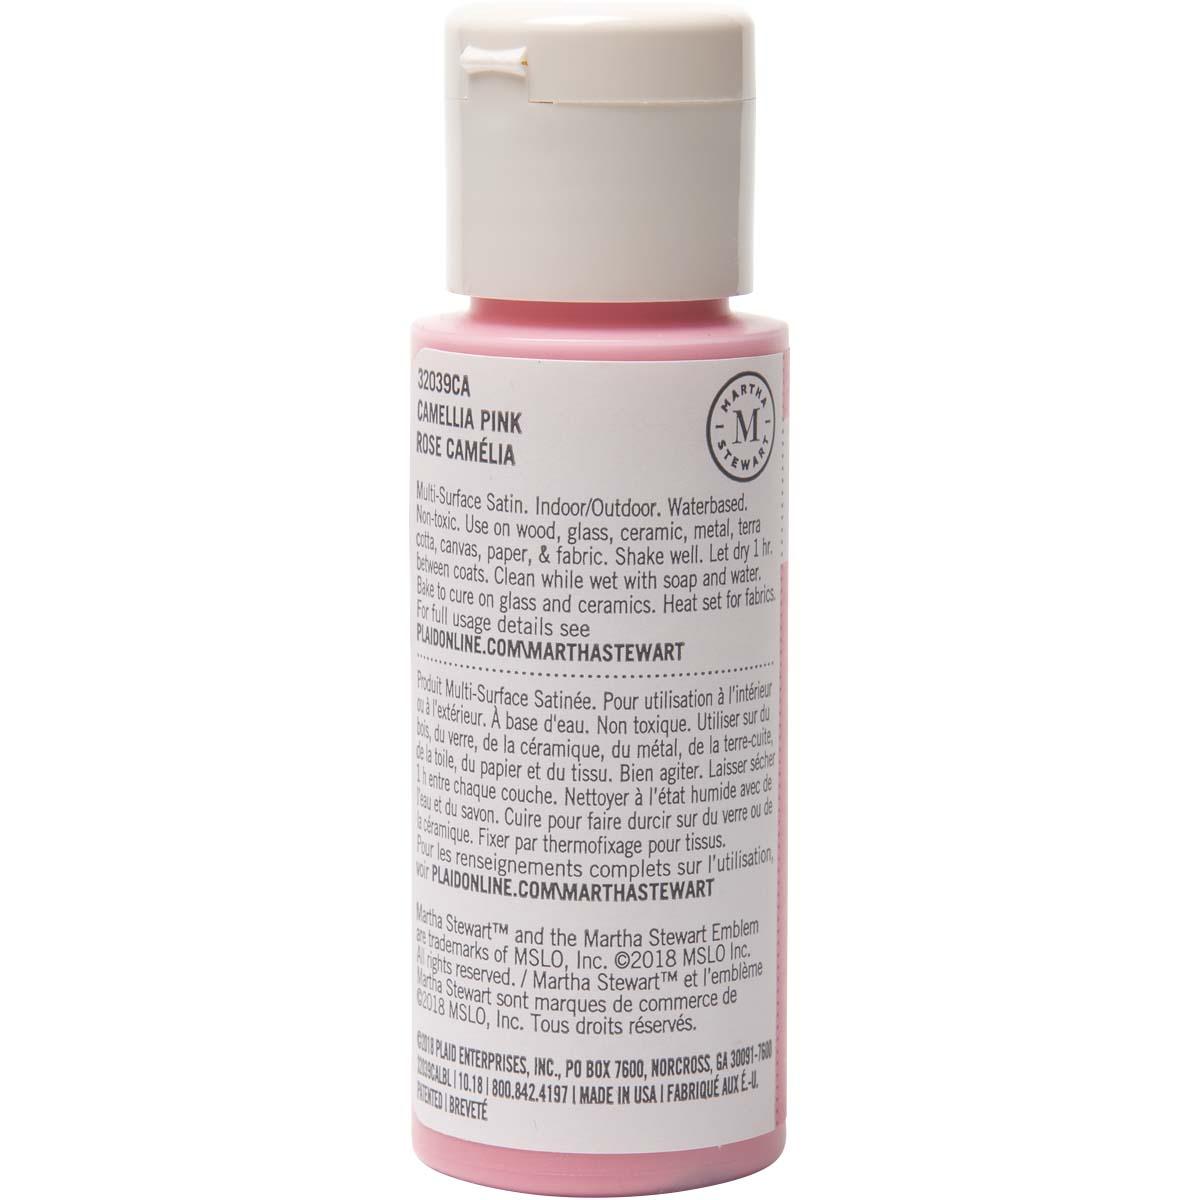 Martha Stewart ® Multi-Surface Satin Acrylic Craft Paint - Camellia Pink, 2 oz.